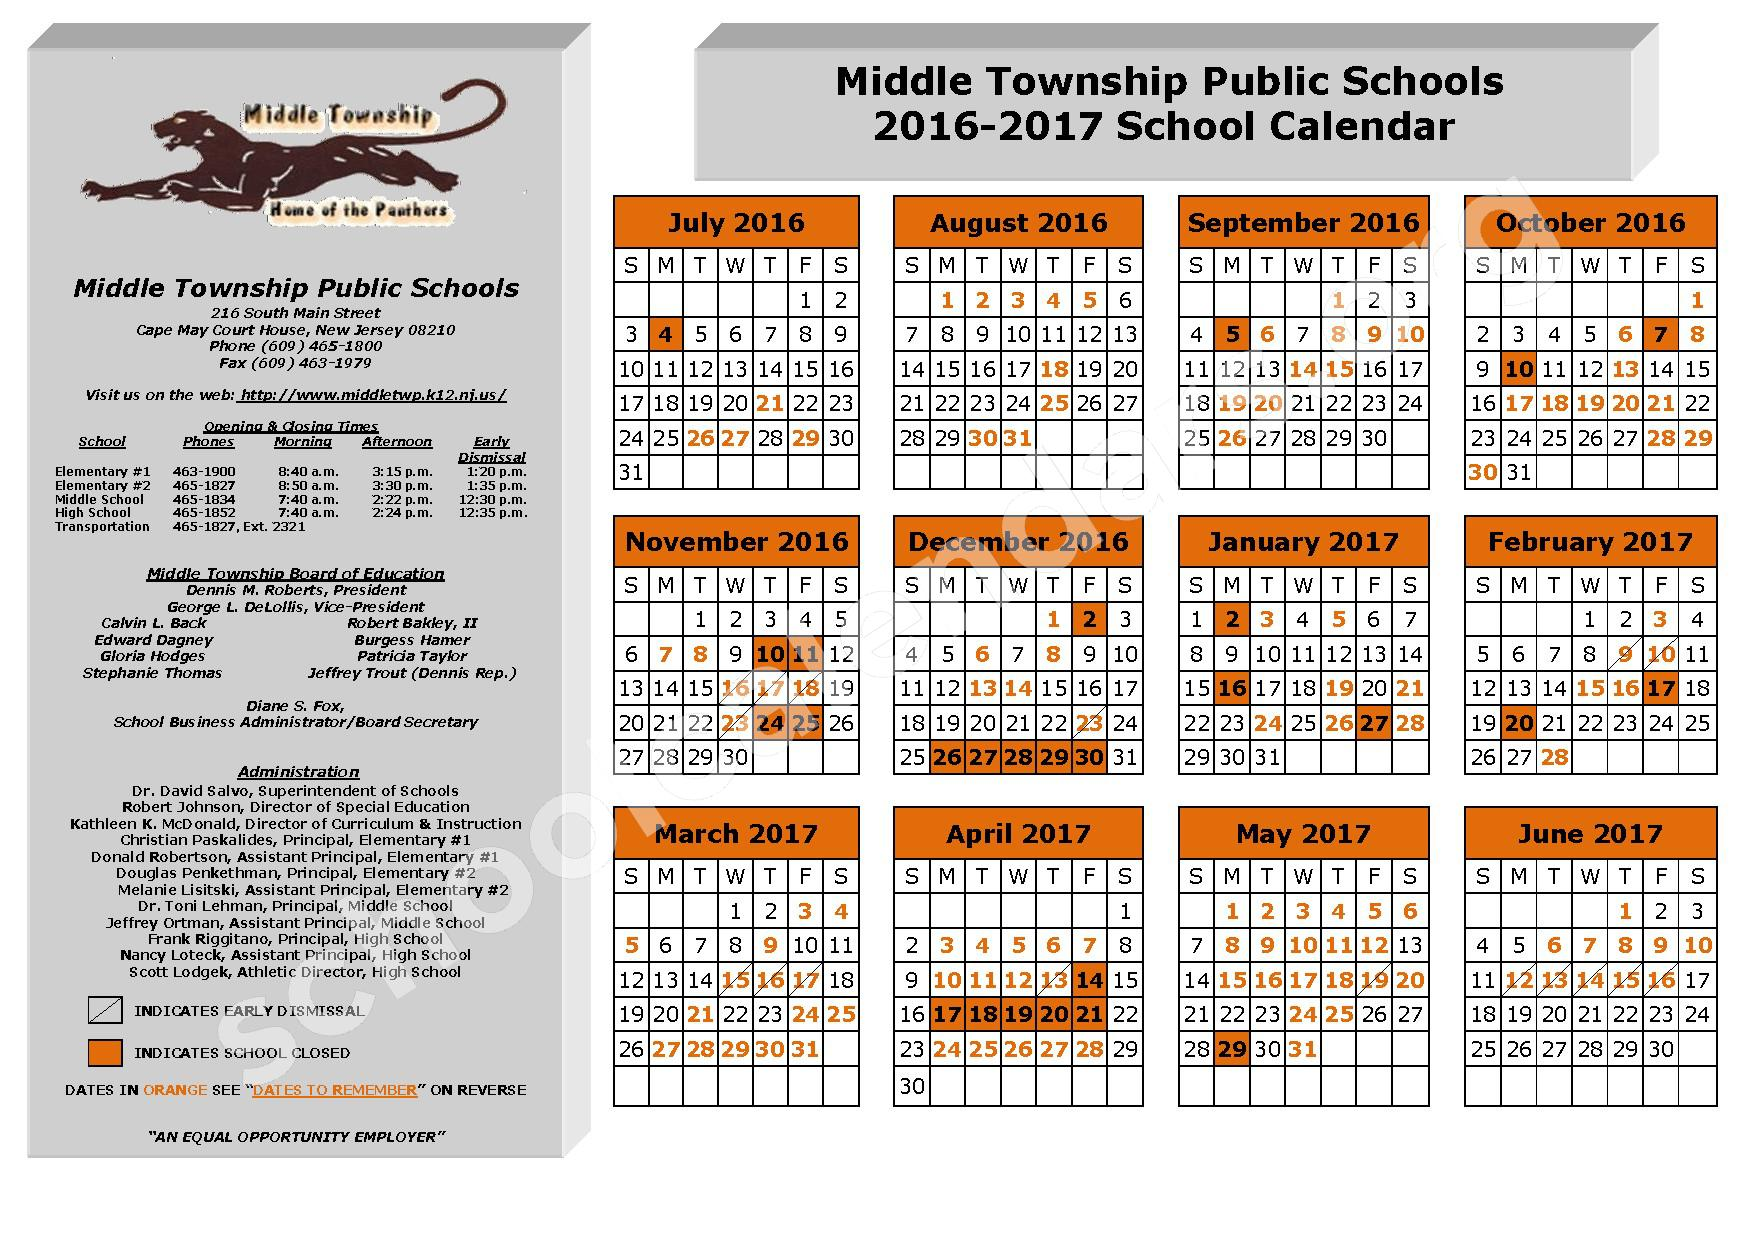 2016 - 2017 School Calendar – Middle Township Public Schools – page 1